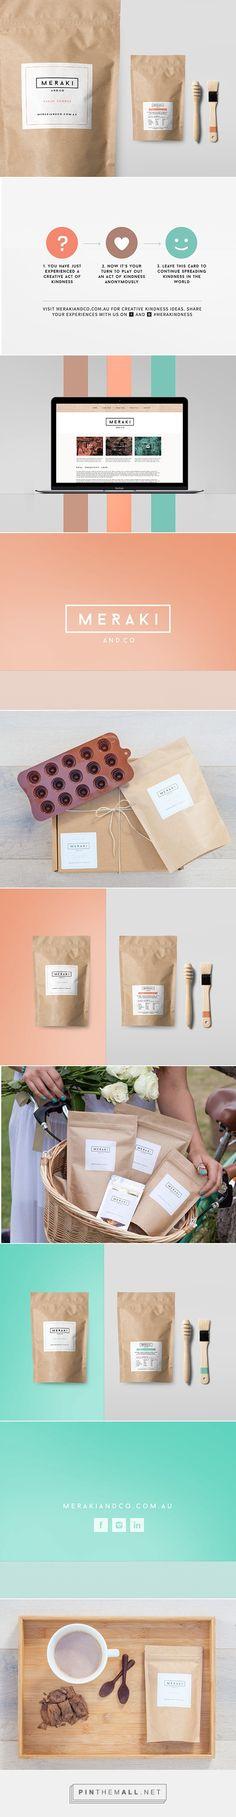 Raw Chocolate, Sugar Free Chocolate, Chocolate Lovers, Chocolate Packaging, Food Packaging Design, Raw Cacao, Meraki, Label Design, Whole Food Recipes